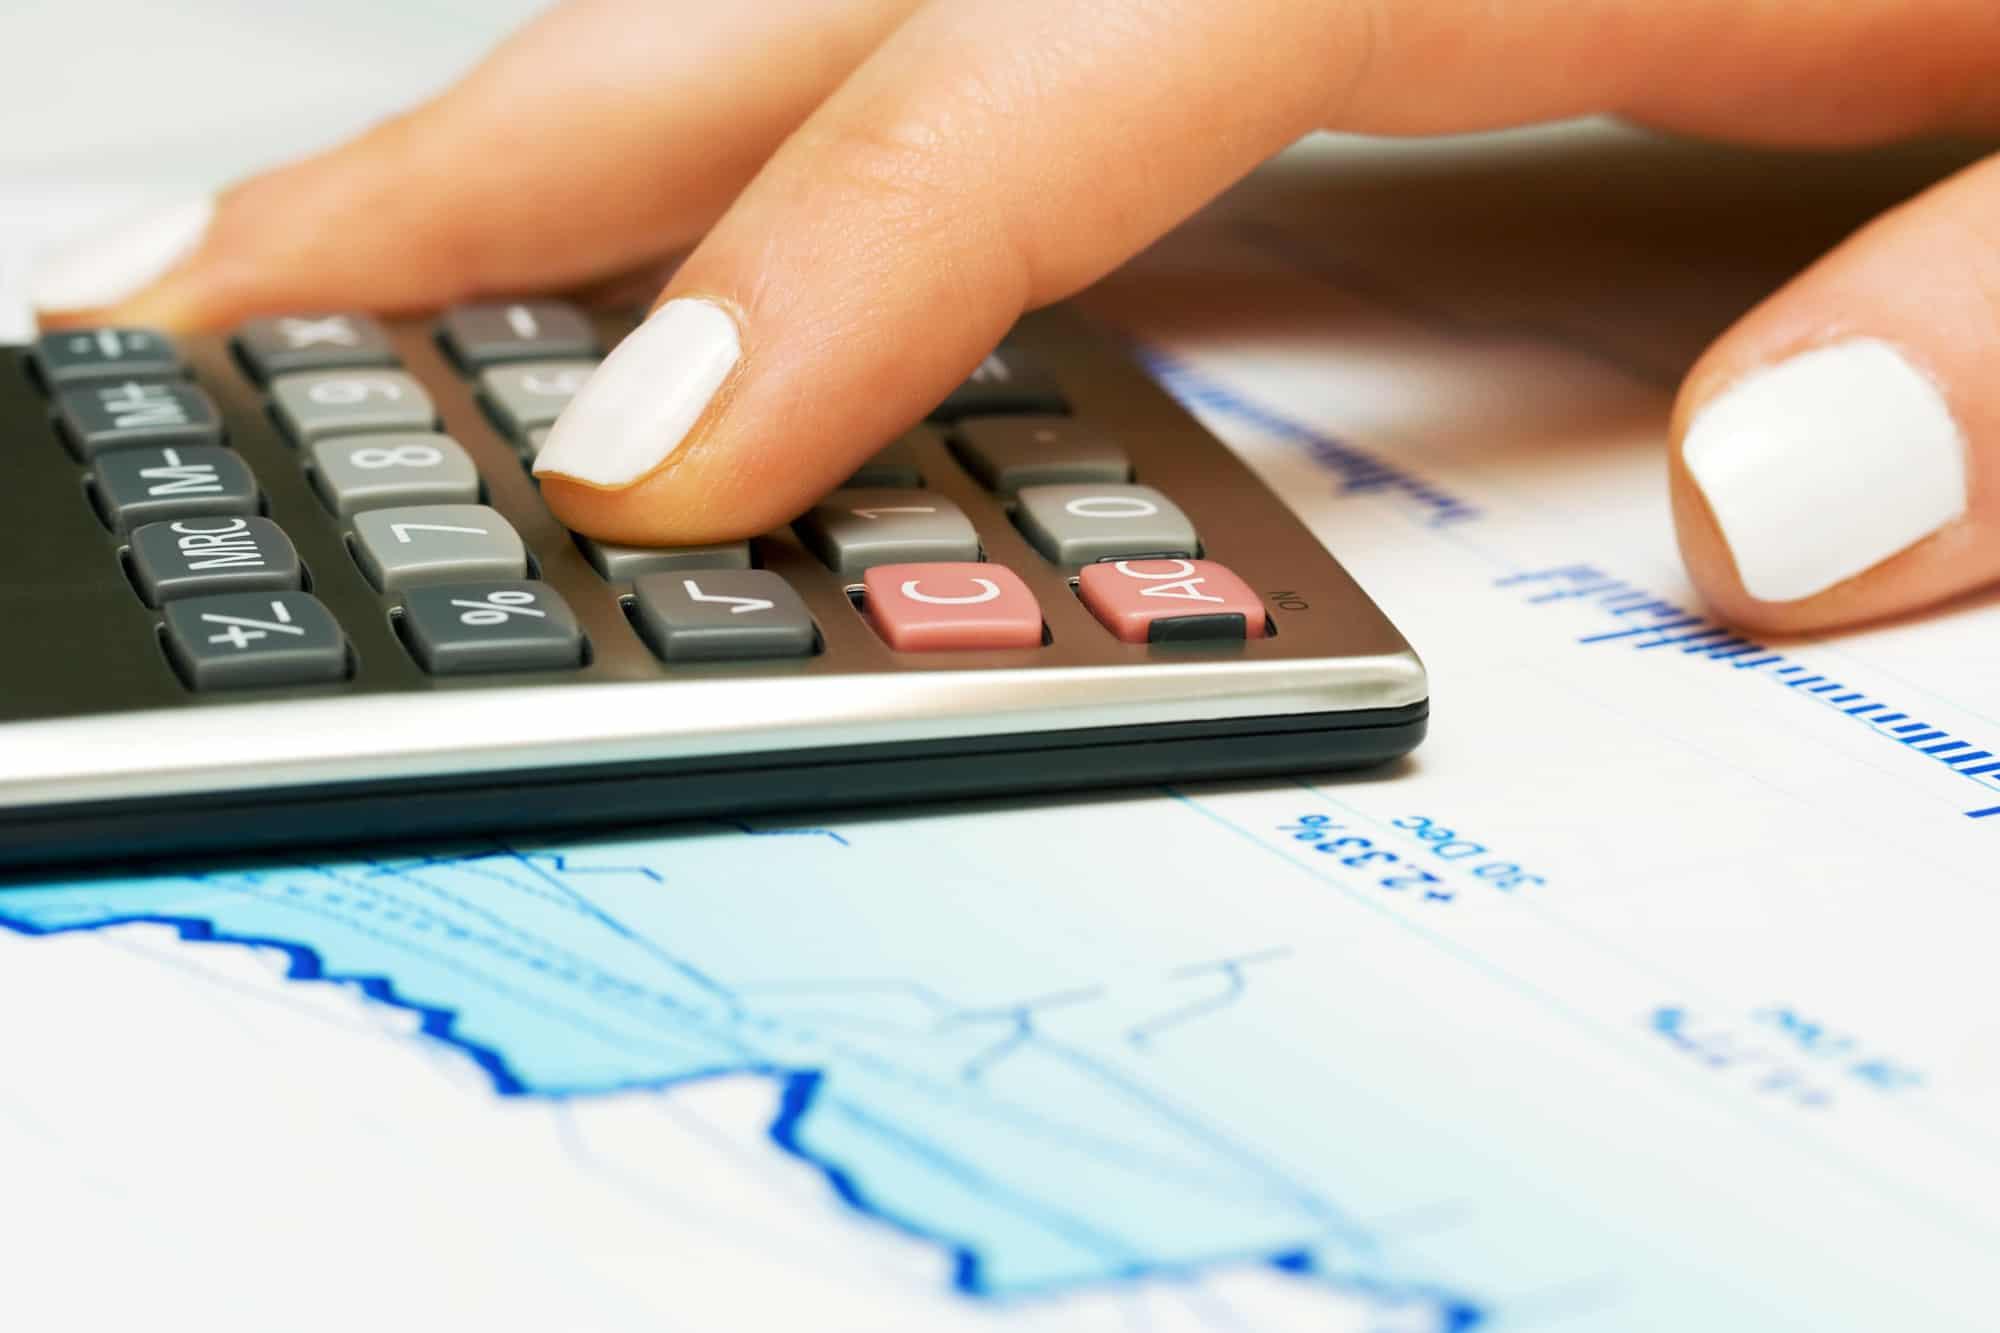 расчёт кредита онлайн втб 24